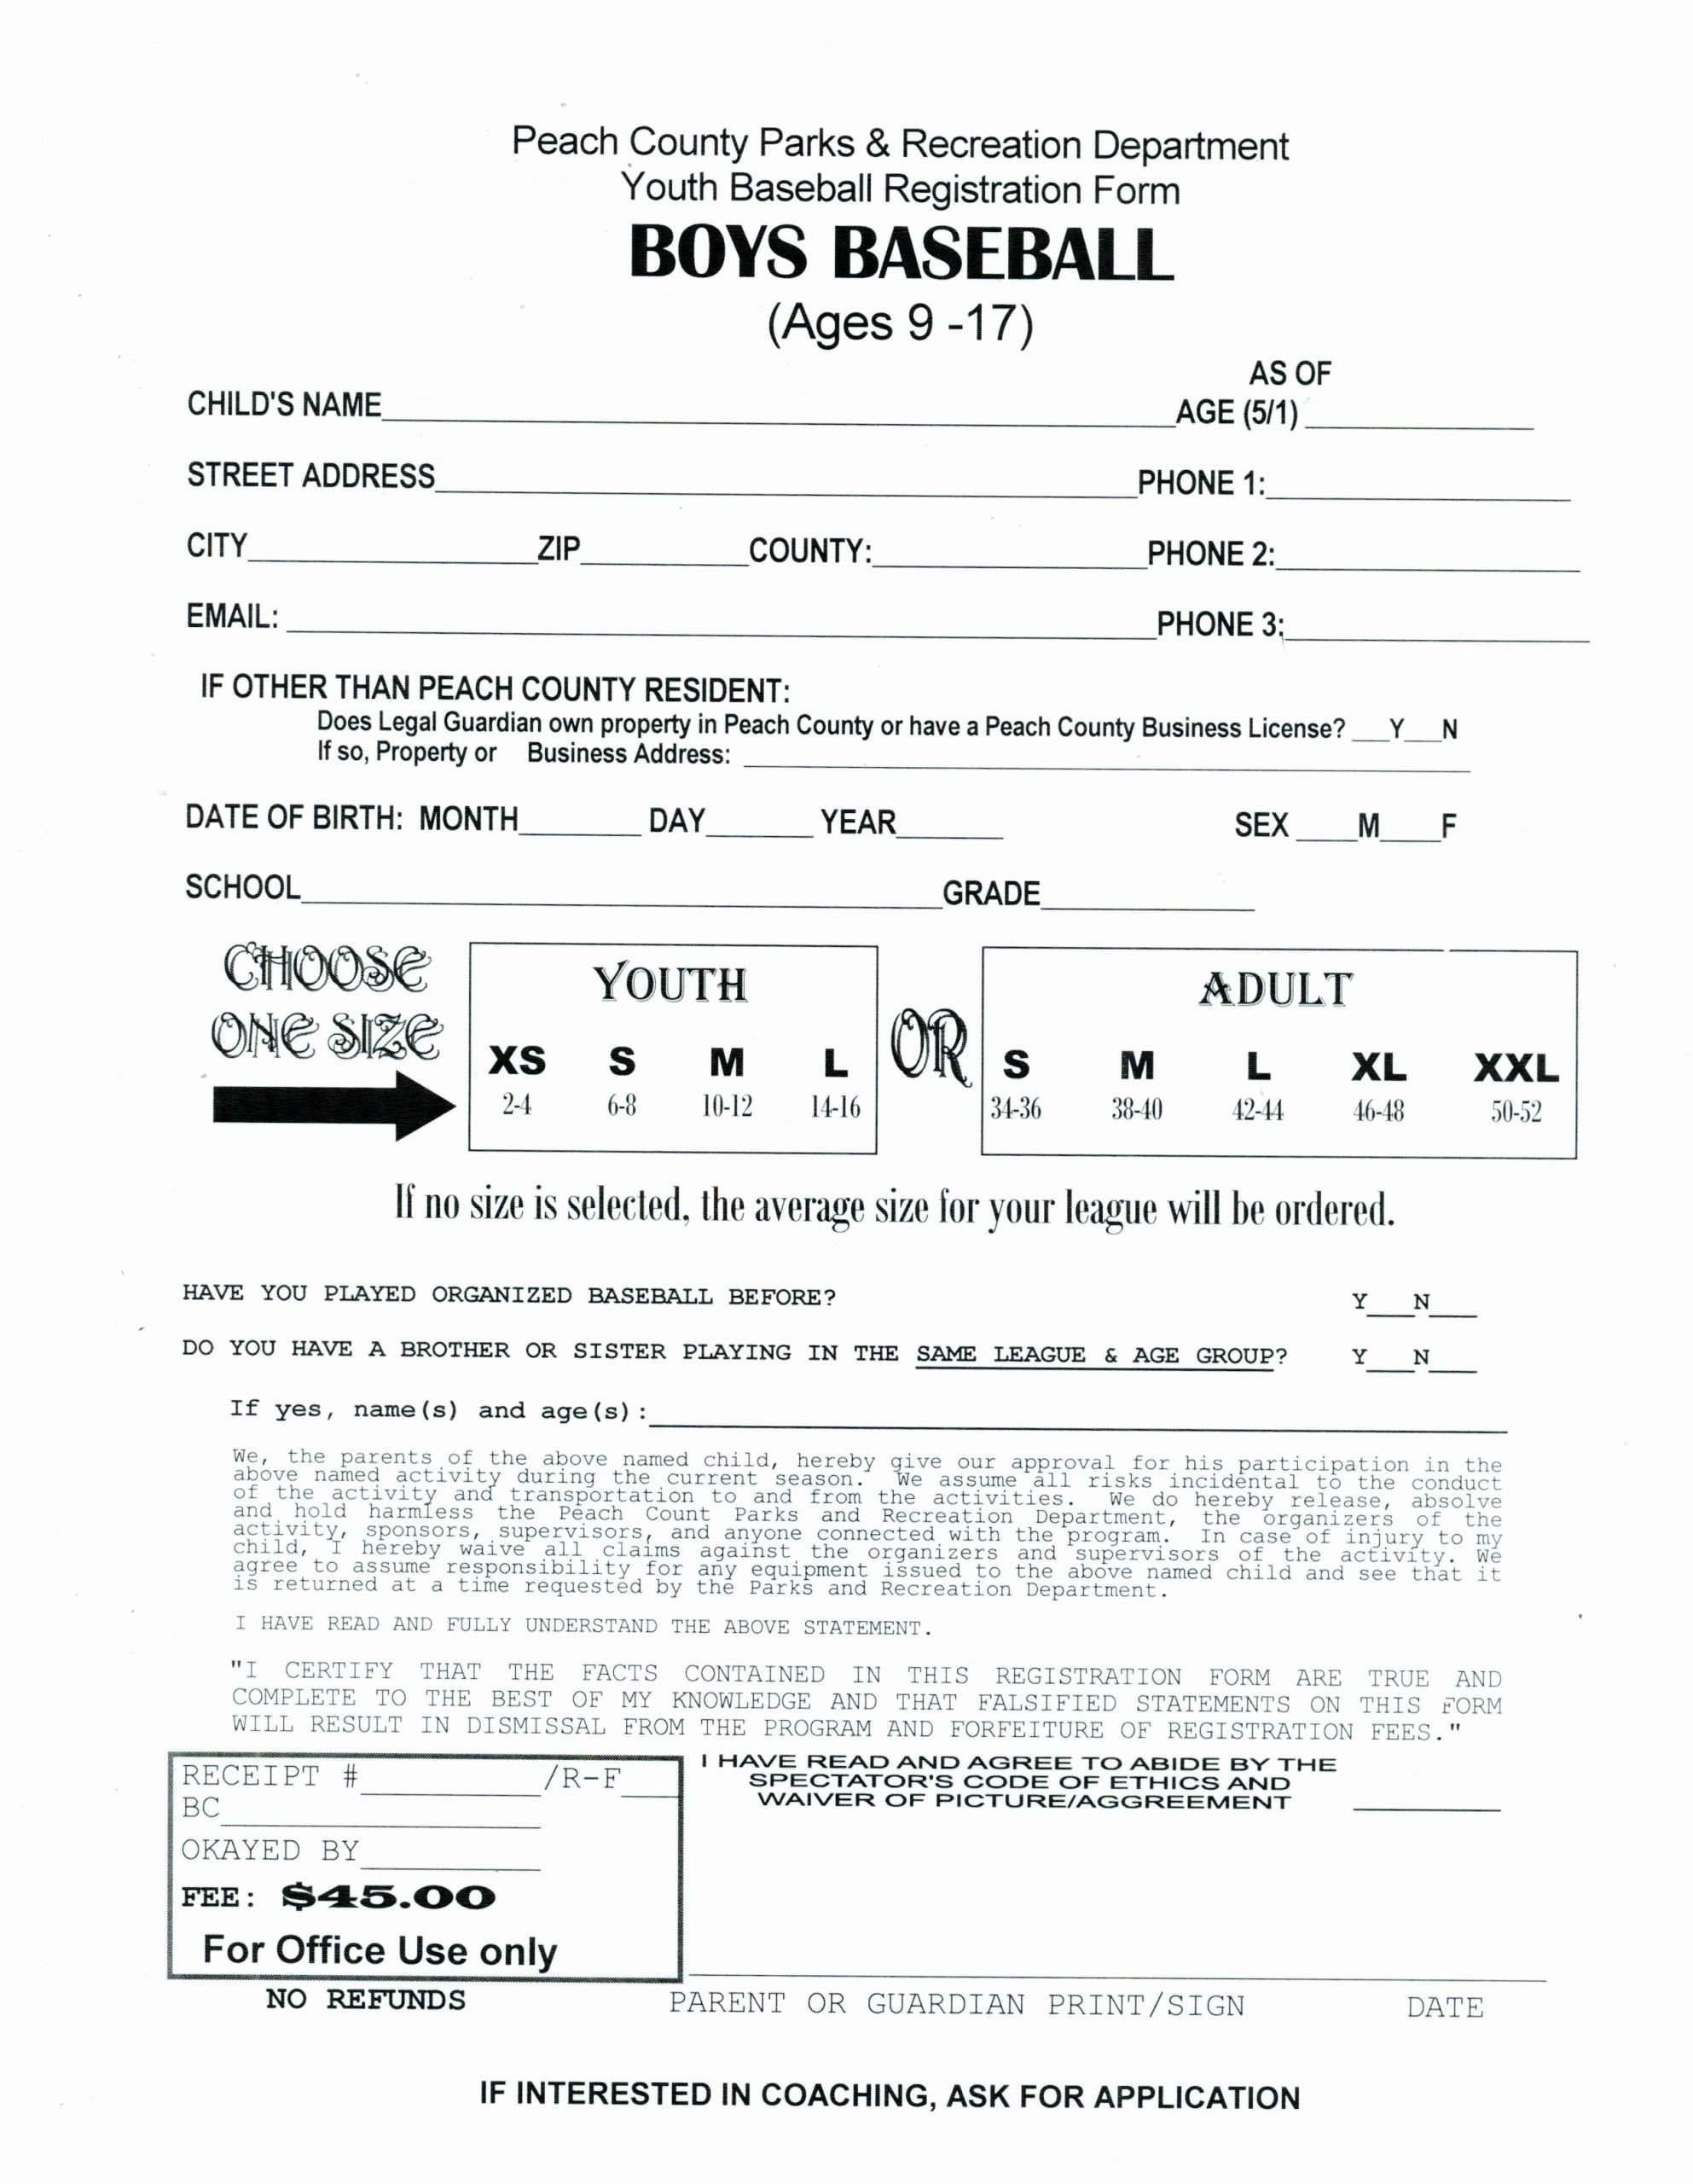 Cheerleading Registration form Template Fresh Index Of Cdn 16 1994 130